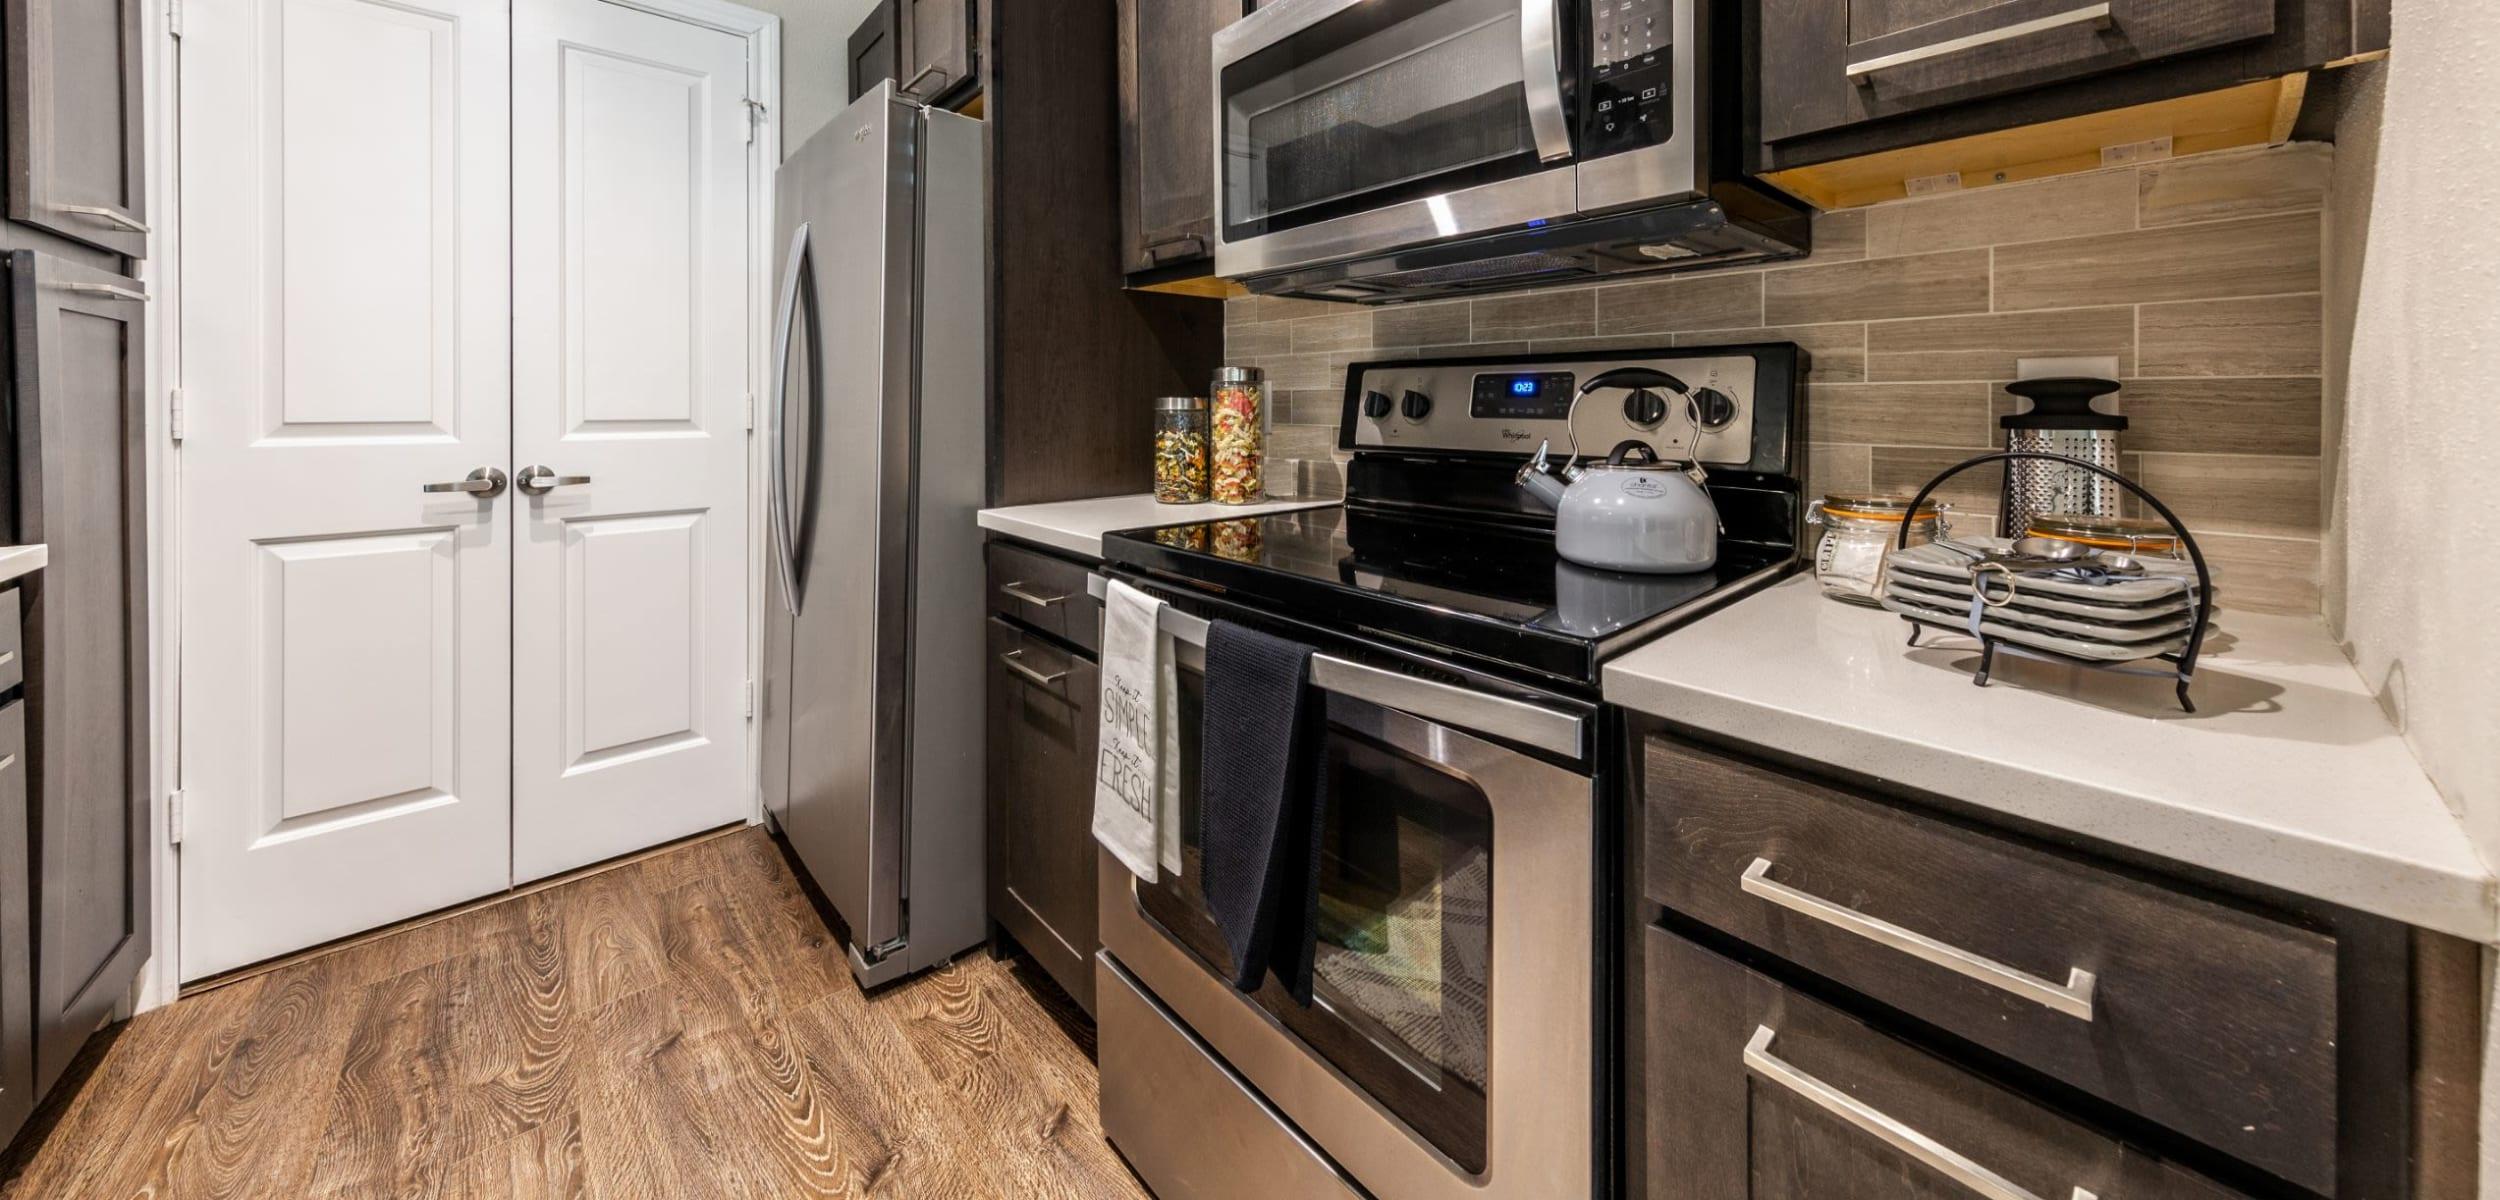 Modern, sleek kitchen at Marquis on Memorial in Houston, Texas